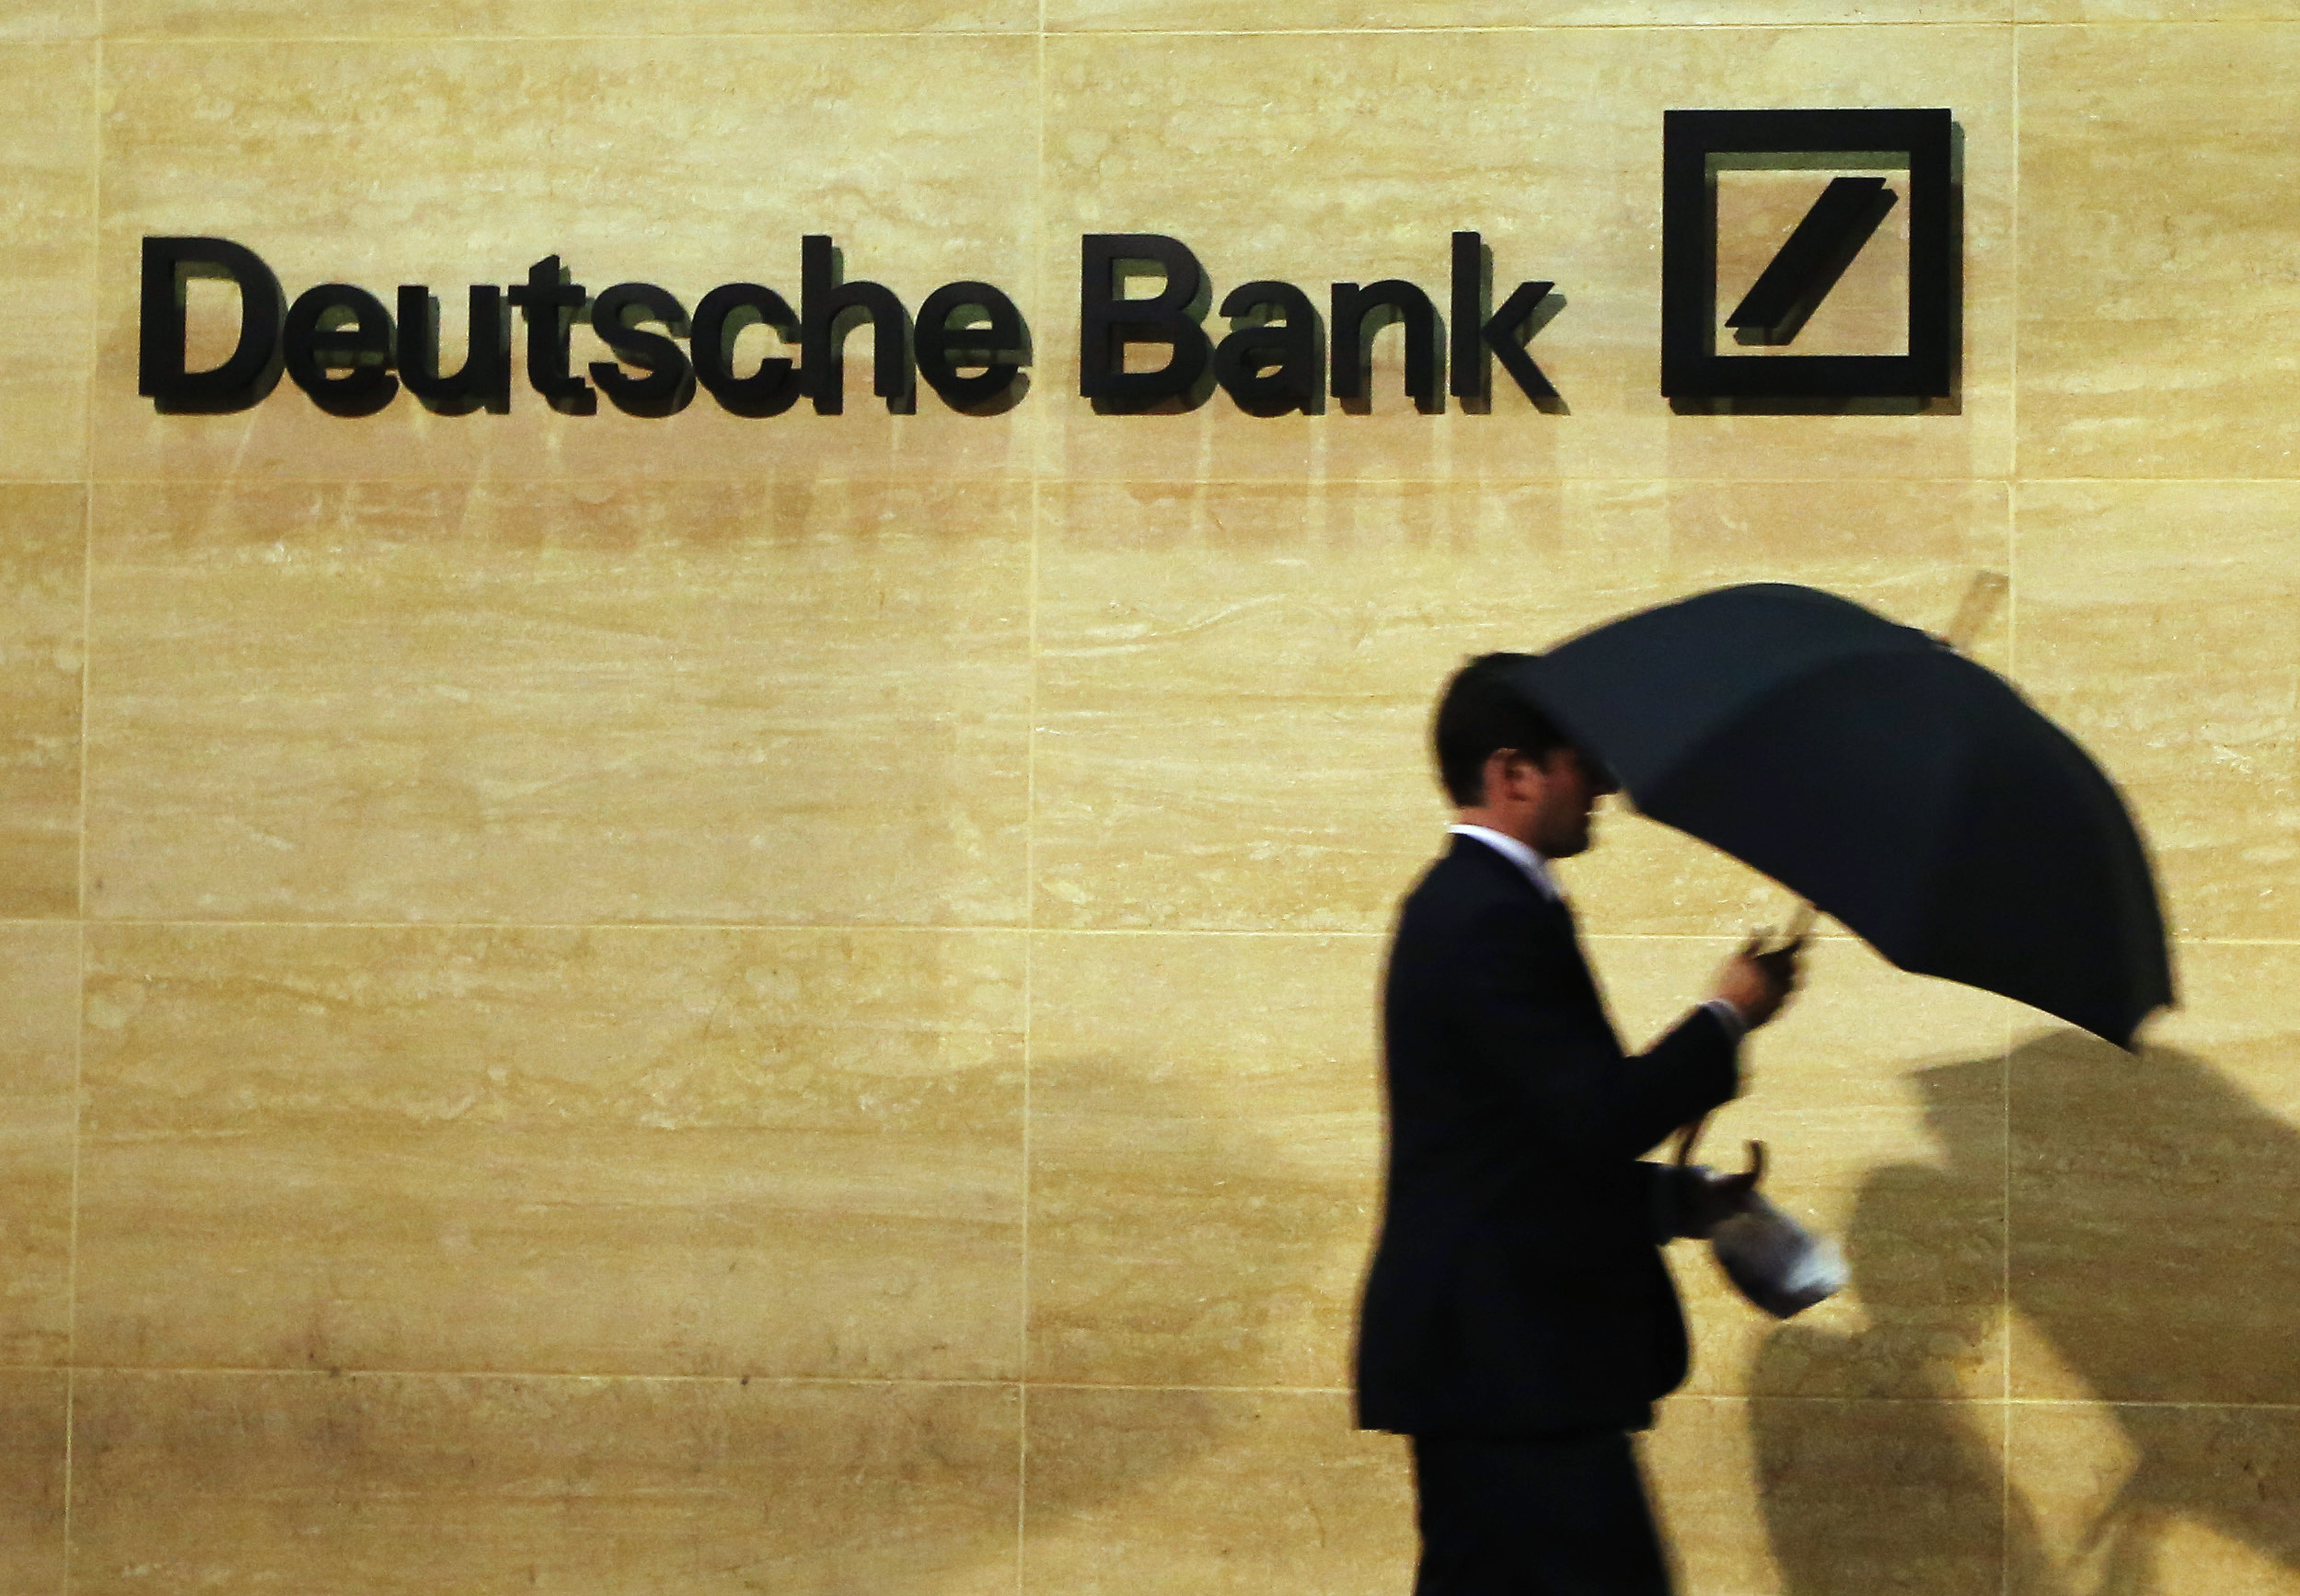 European Stocks Rally On Relief Over Reported Deutsche Bank Settlement